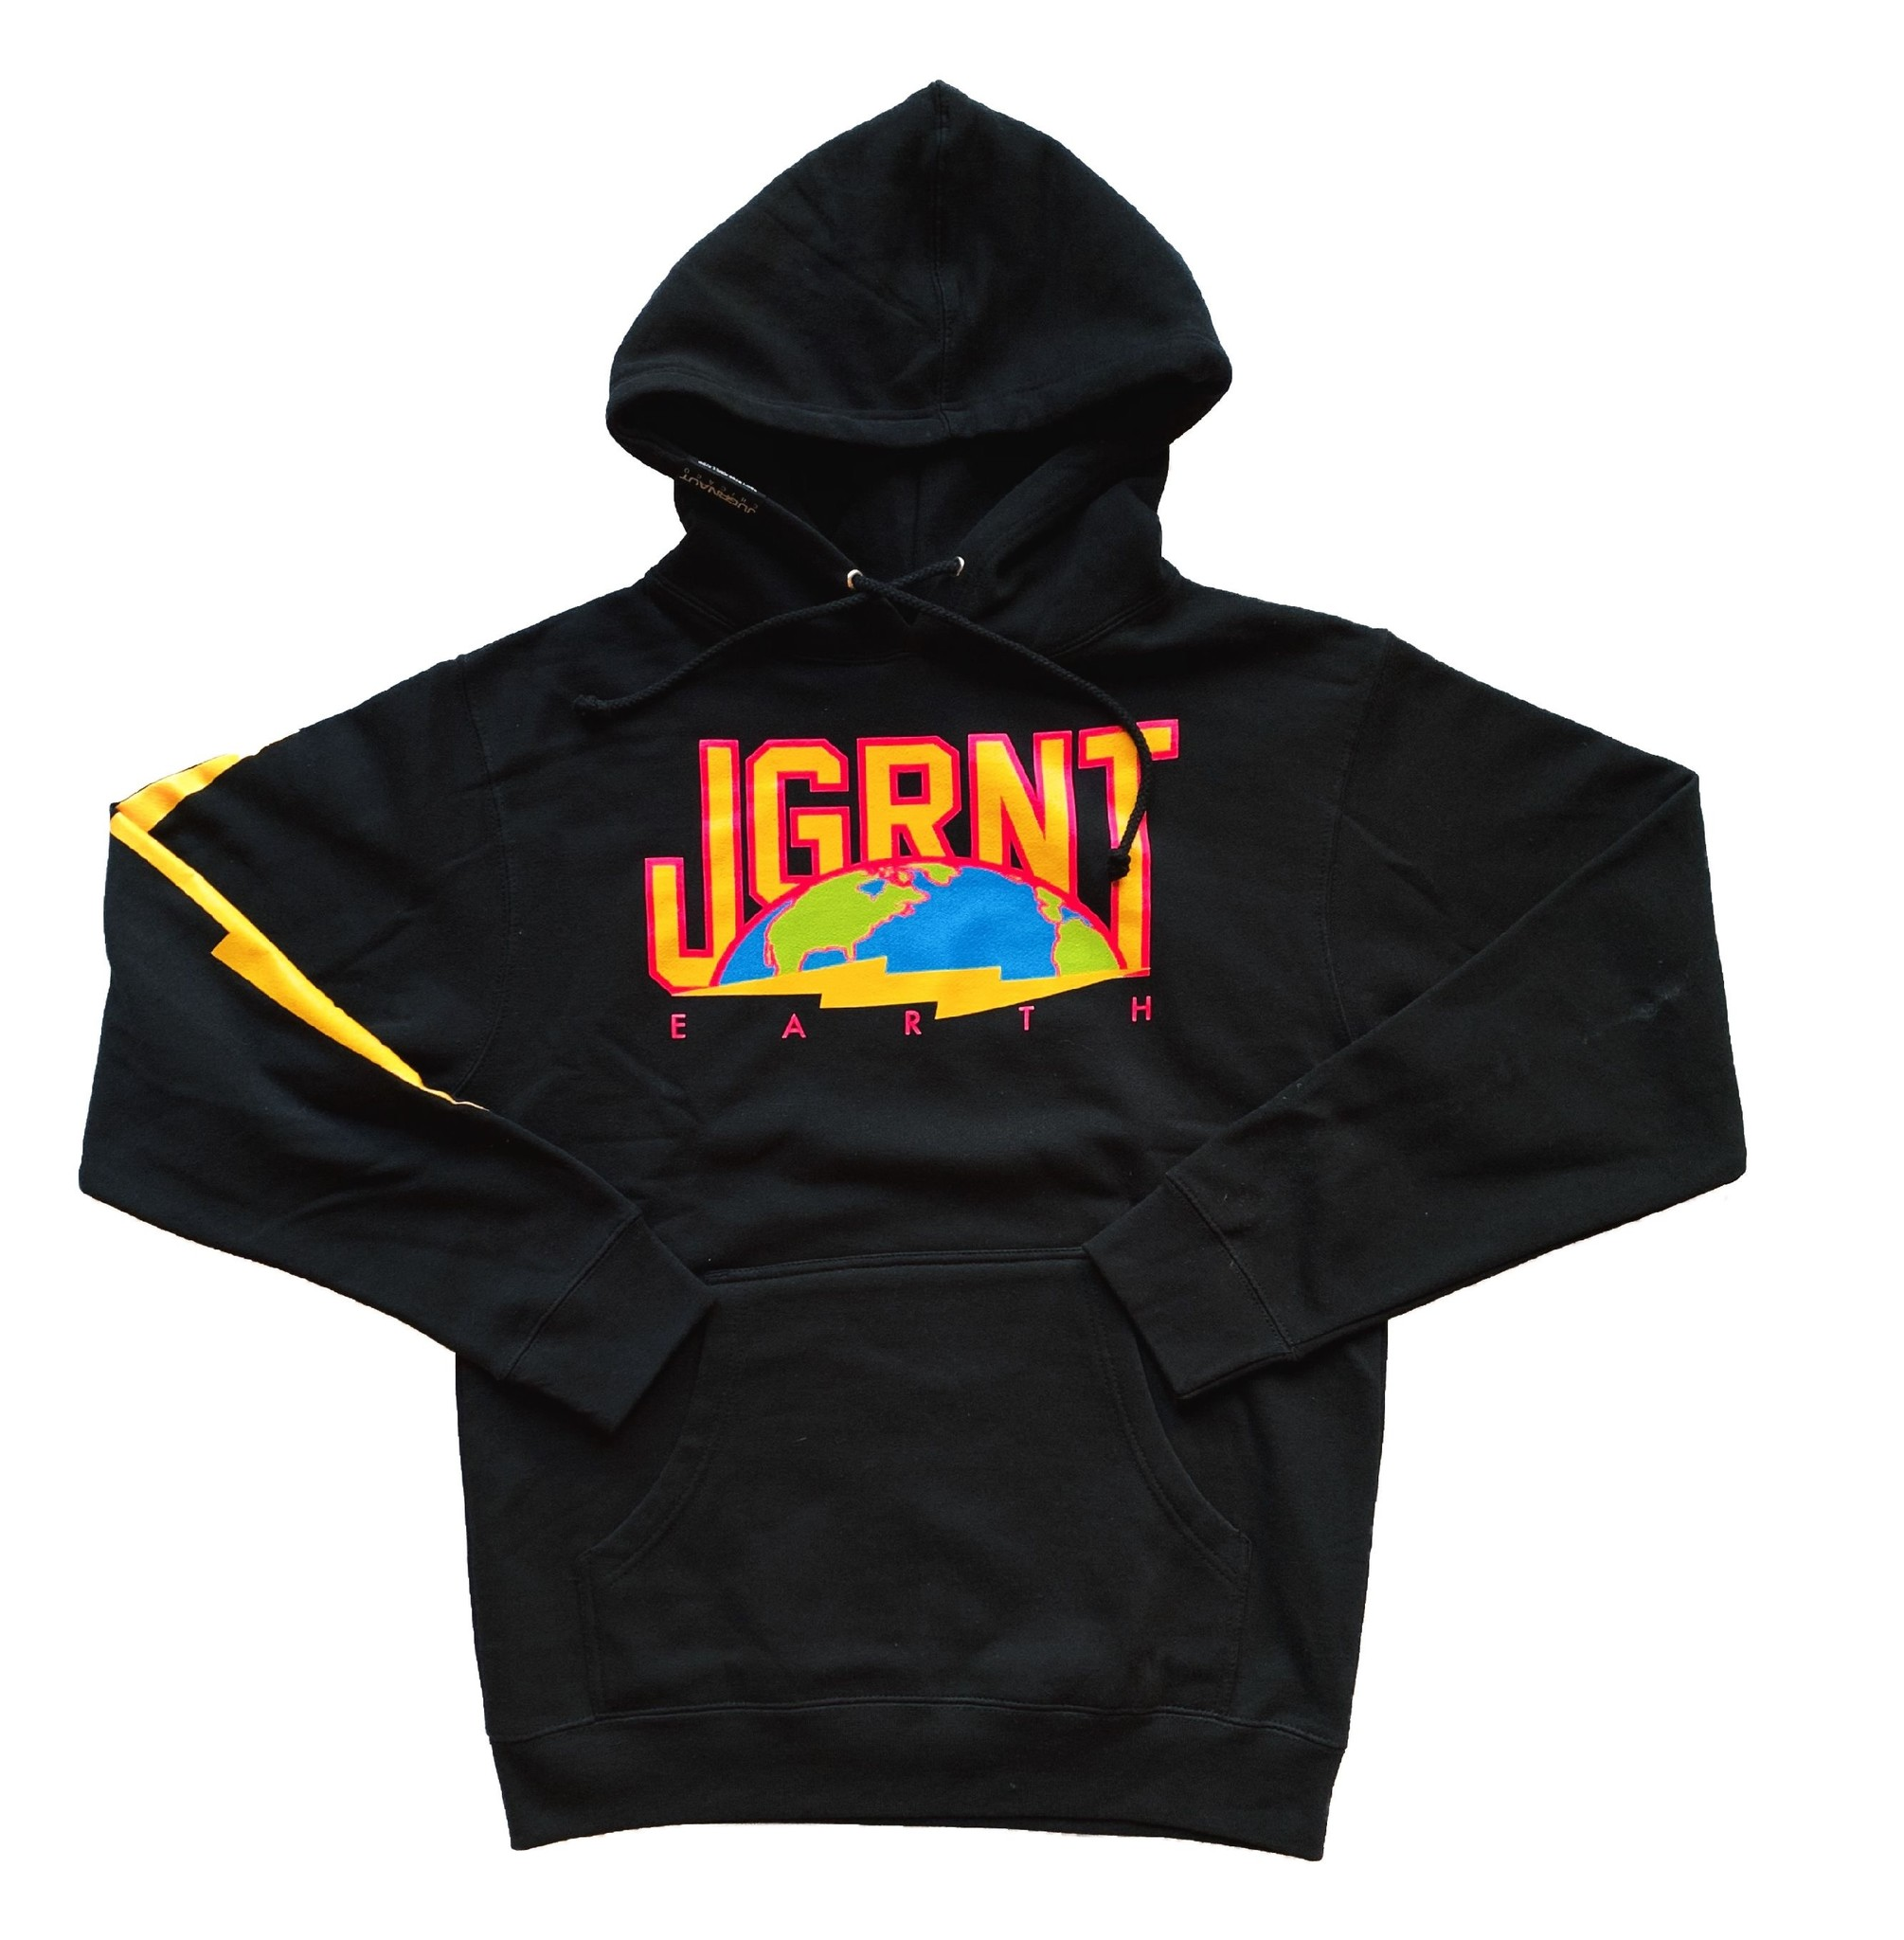 Jugrnaut Jugrnaut Earth Hoodie Black